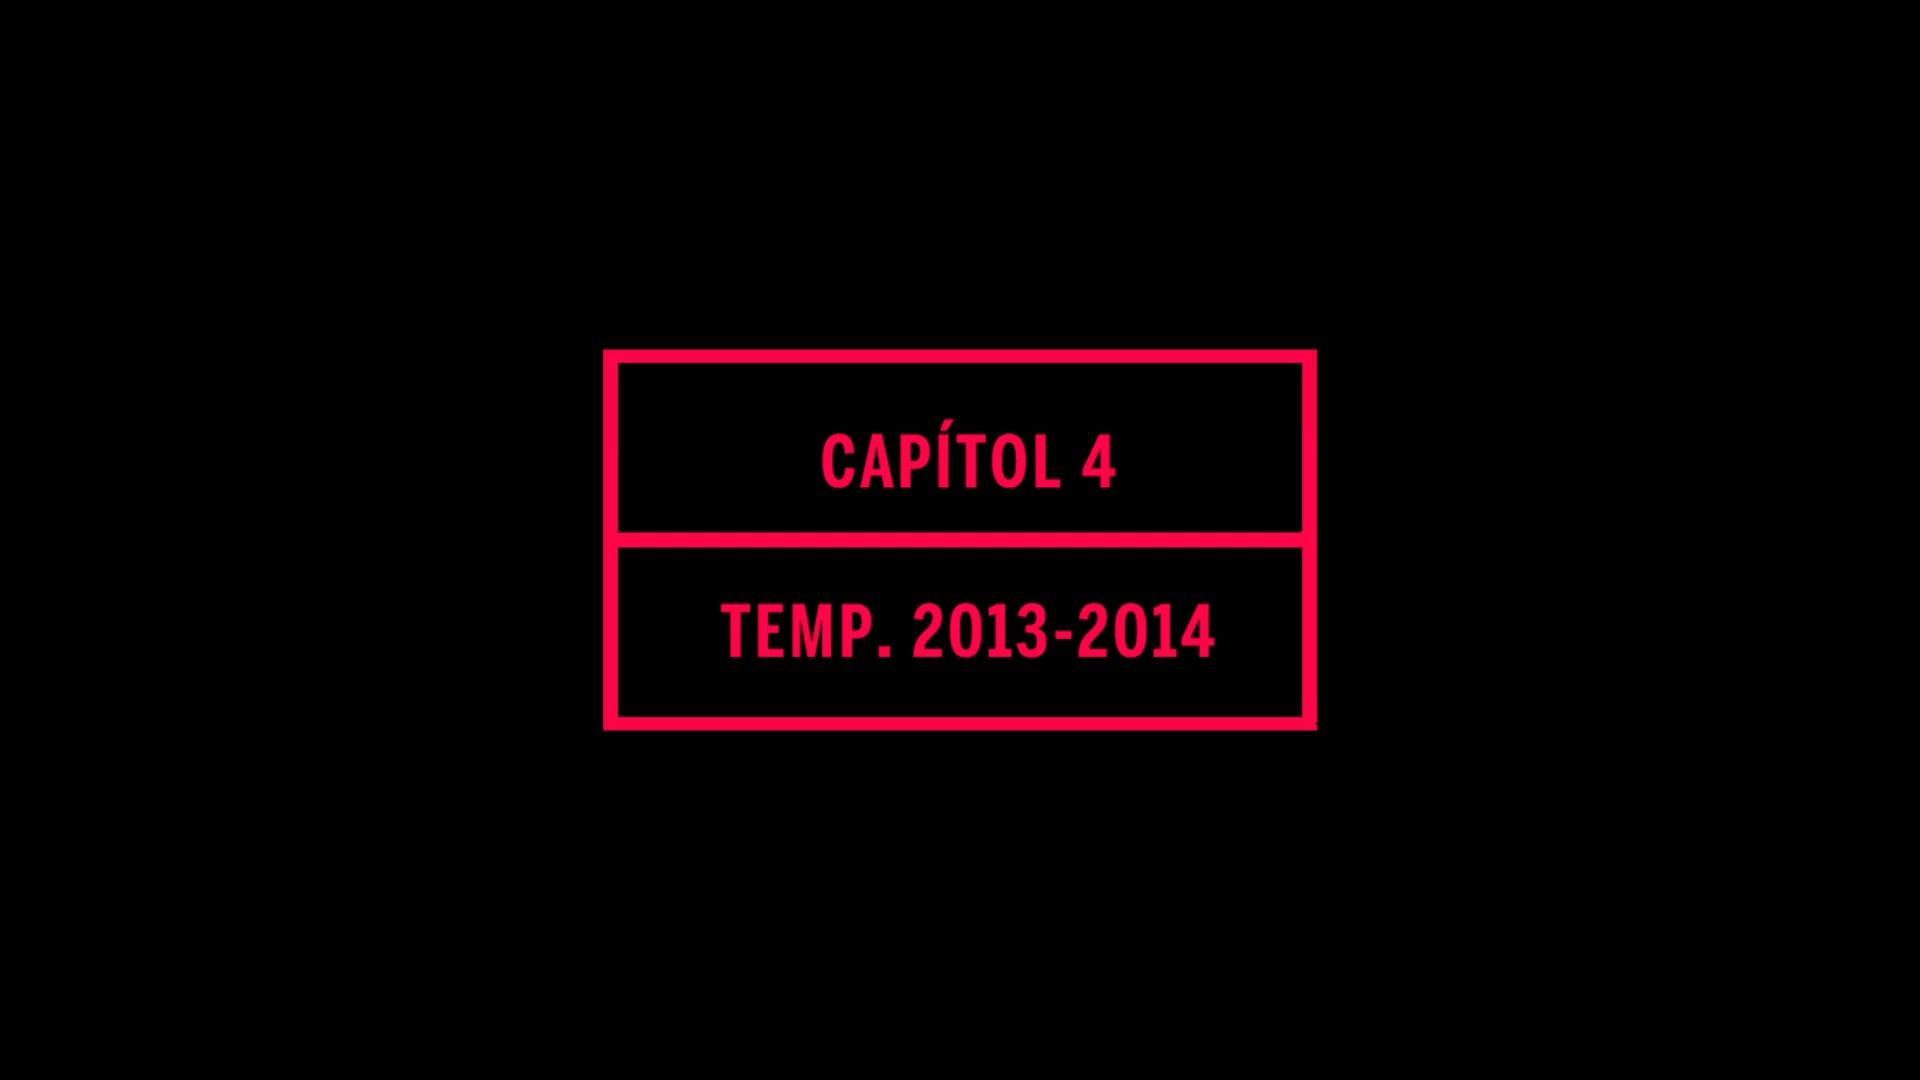 Capítol 04 - Temporada SF 13/14